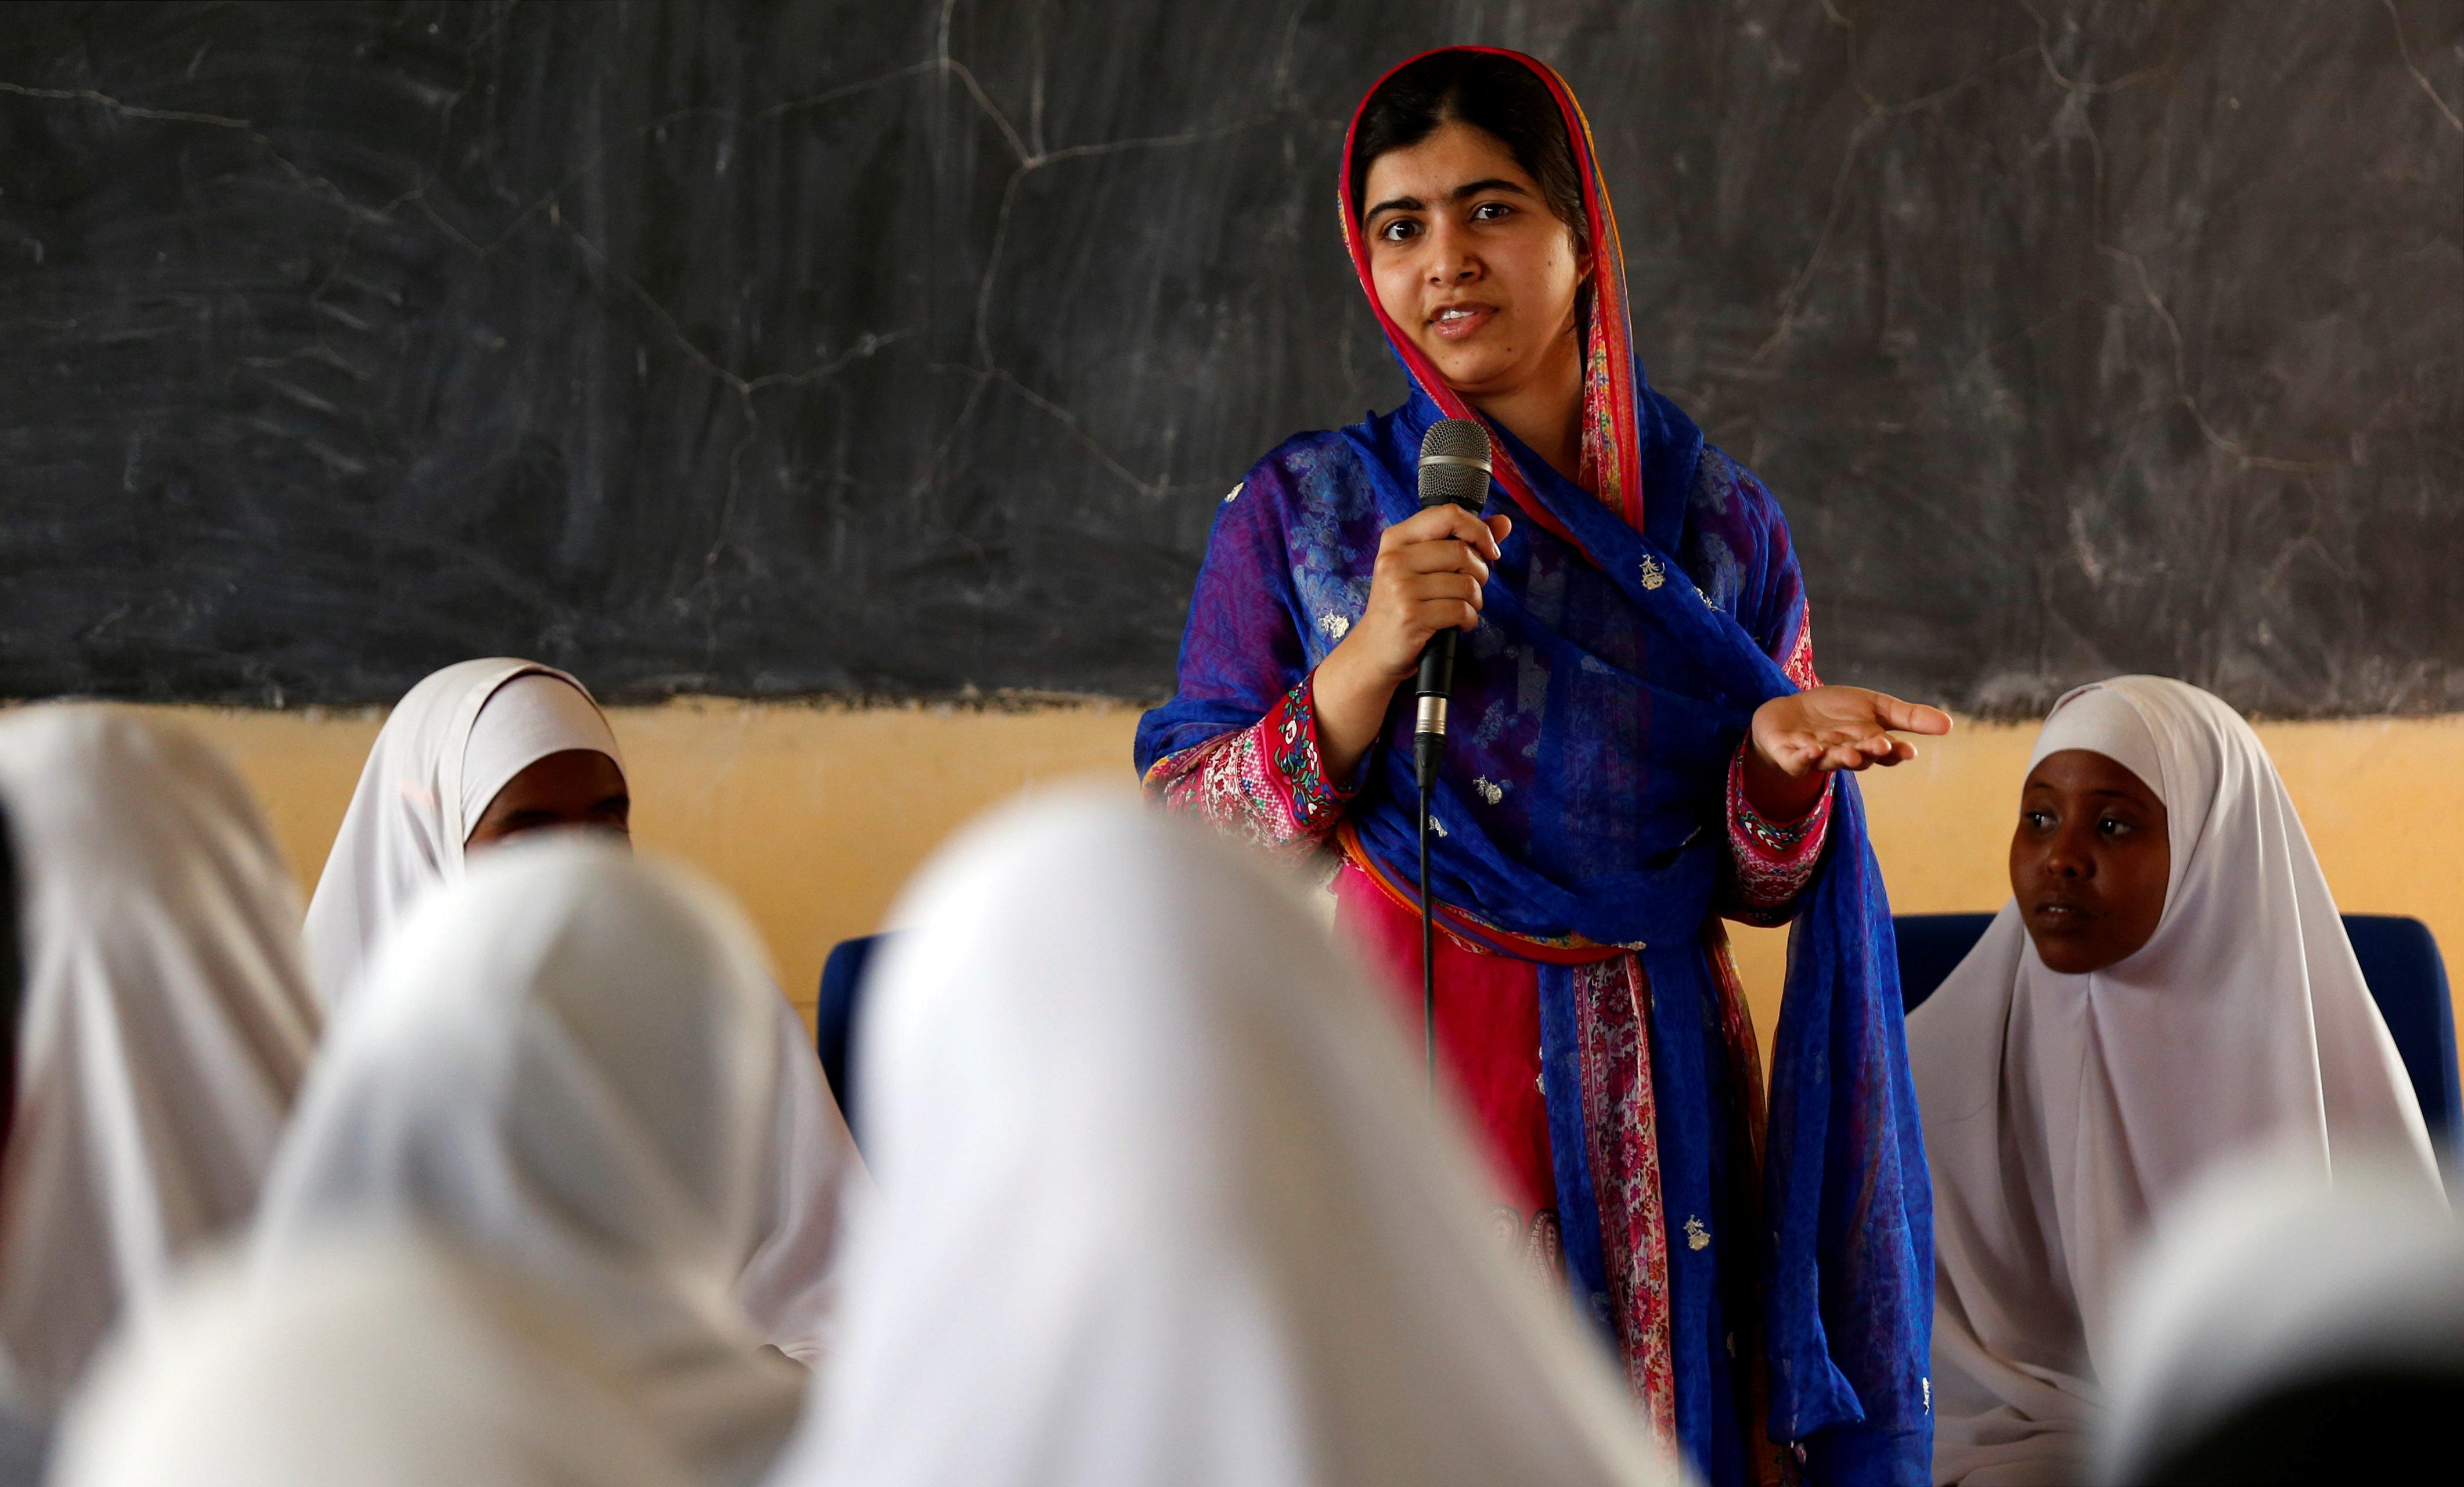 "Malala Yousafzai isa <a href=""https://www.channel4.com/news/malala-yousafzai-im-a-feminist-and-a-muslim"" target=""_blank"